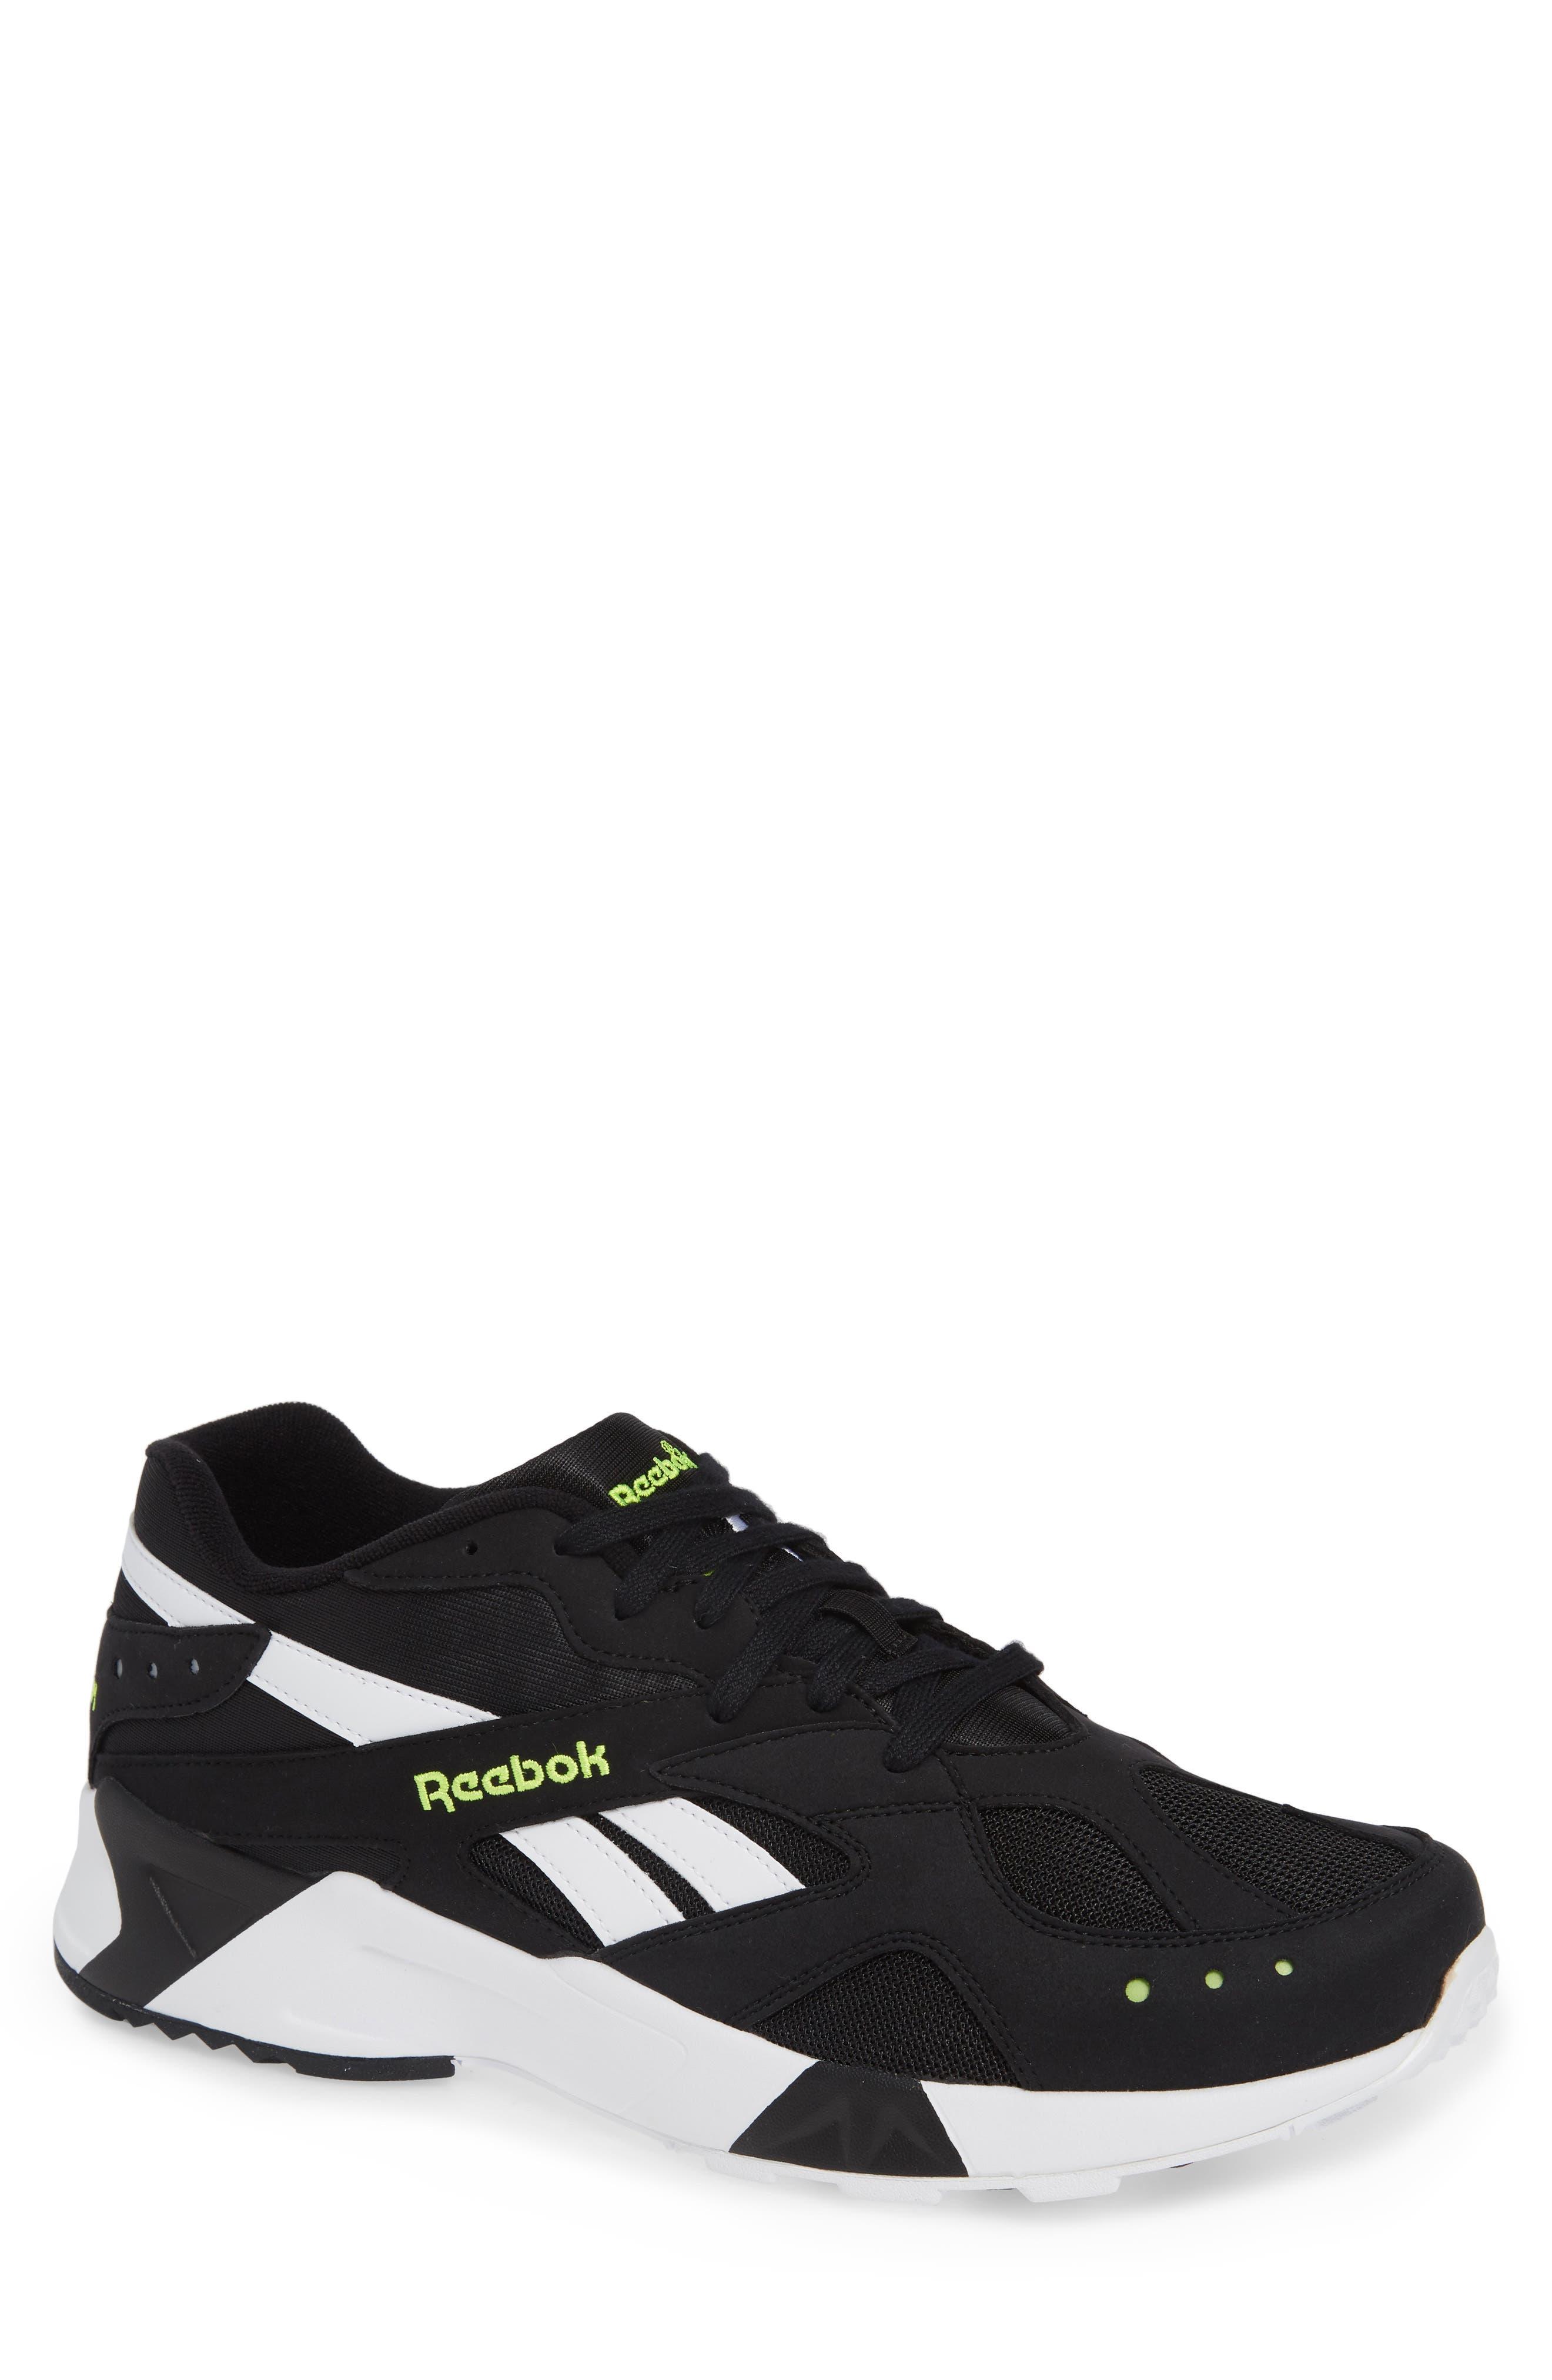 e72e07c82c33 Reebok - Men s Casual Fashion Shoes and Sneakers